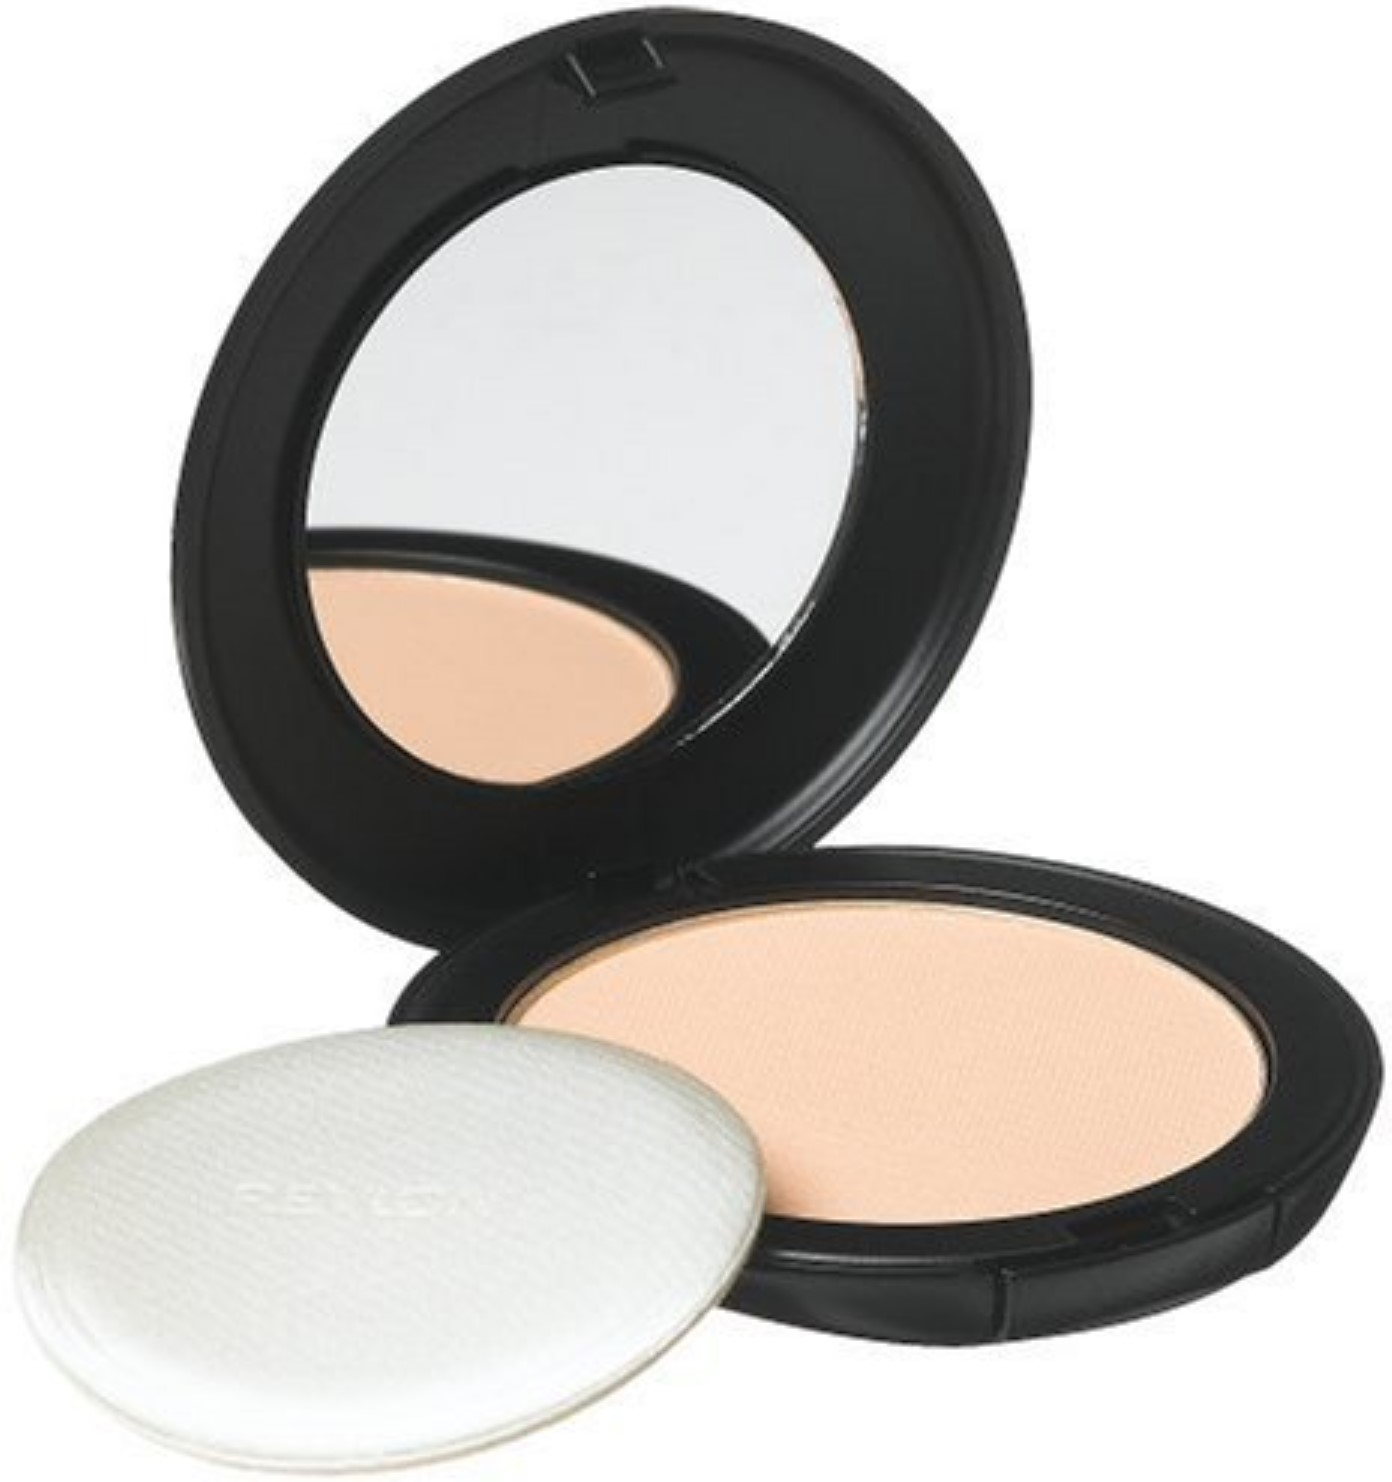 Revlon ColorStay Pressed Powder, Light/Medium [830] 0.30 oz (Pack of 2)